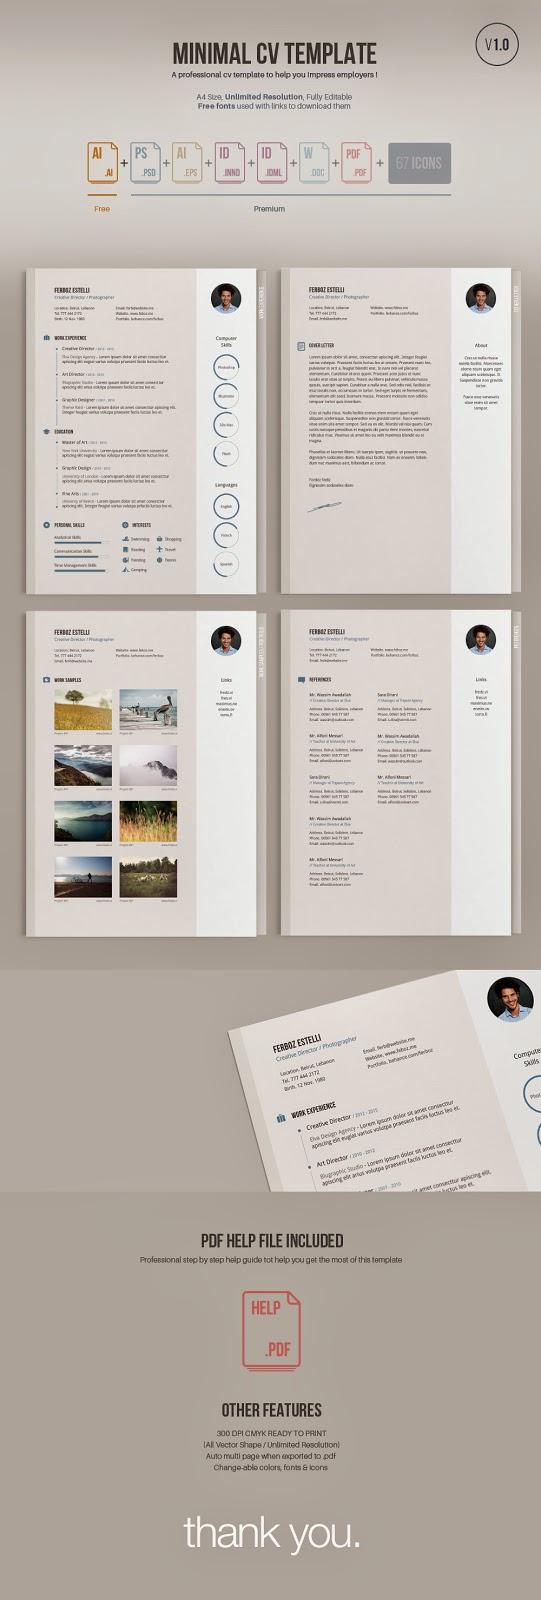 Minimal CV Template in Ai Format